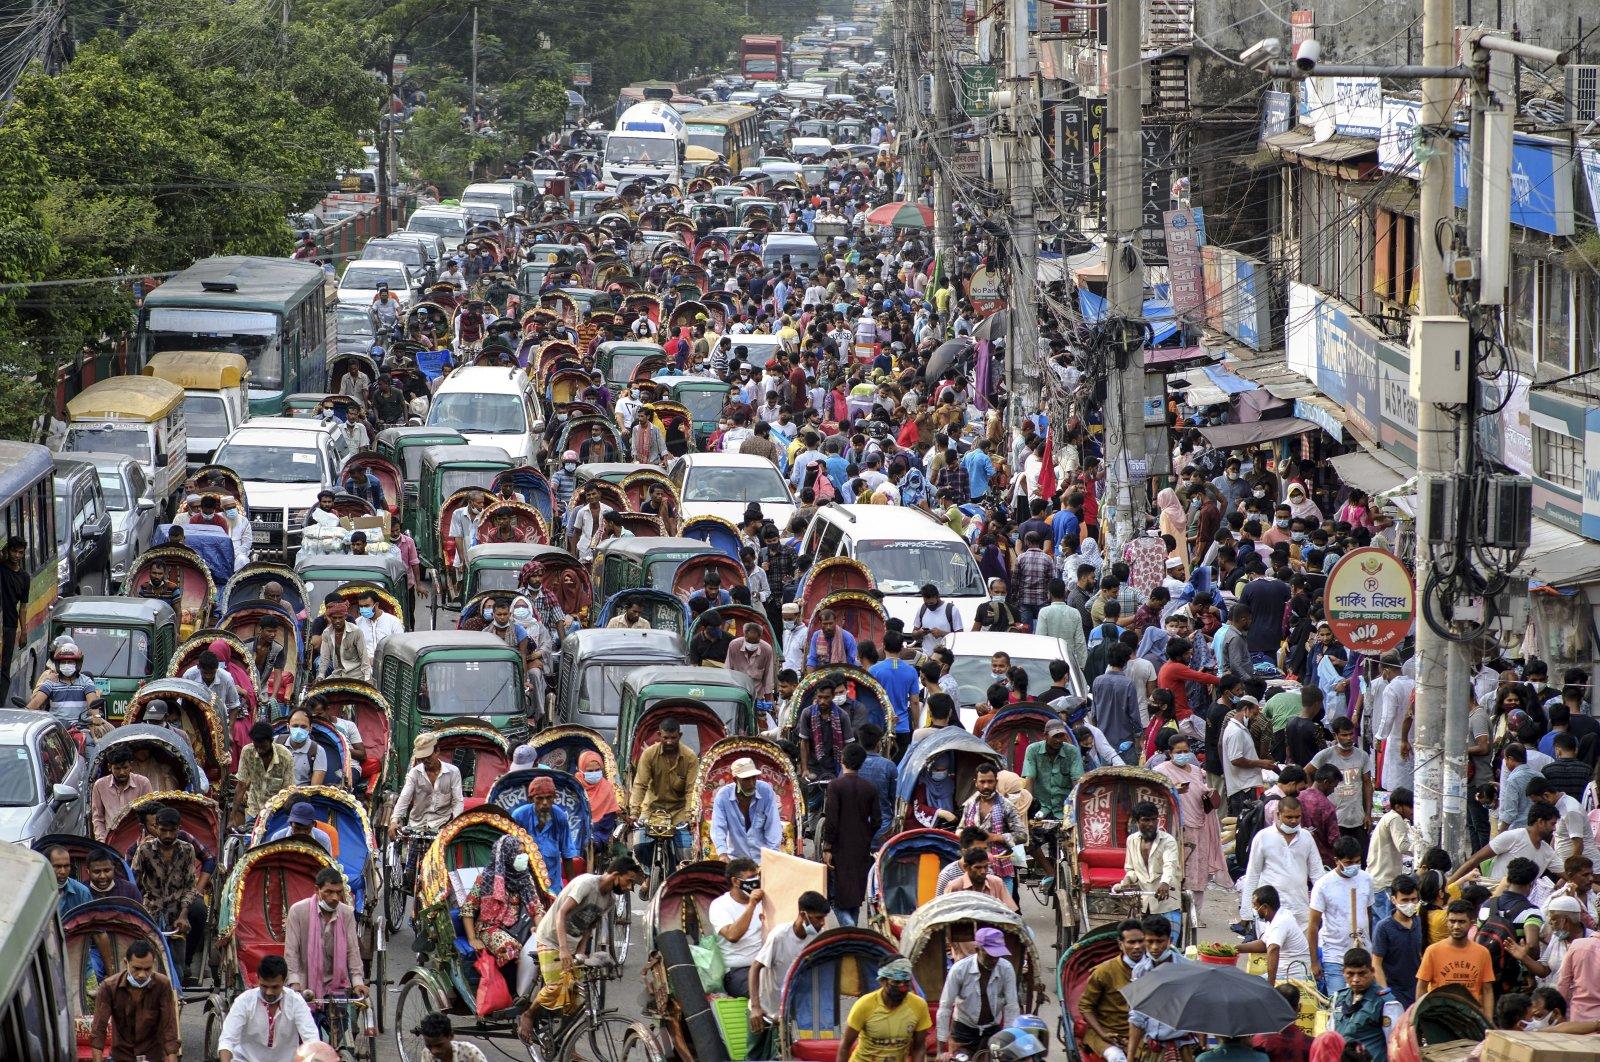 People crowd a market area ahead of Eid al-Adha in Dhaka, Bangladesh, July 16, 2021. (AP Photo)